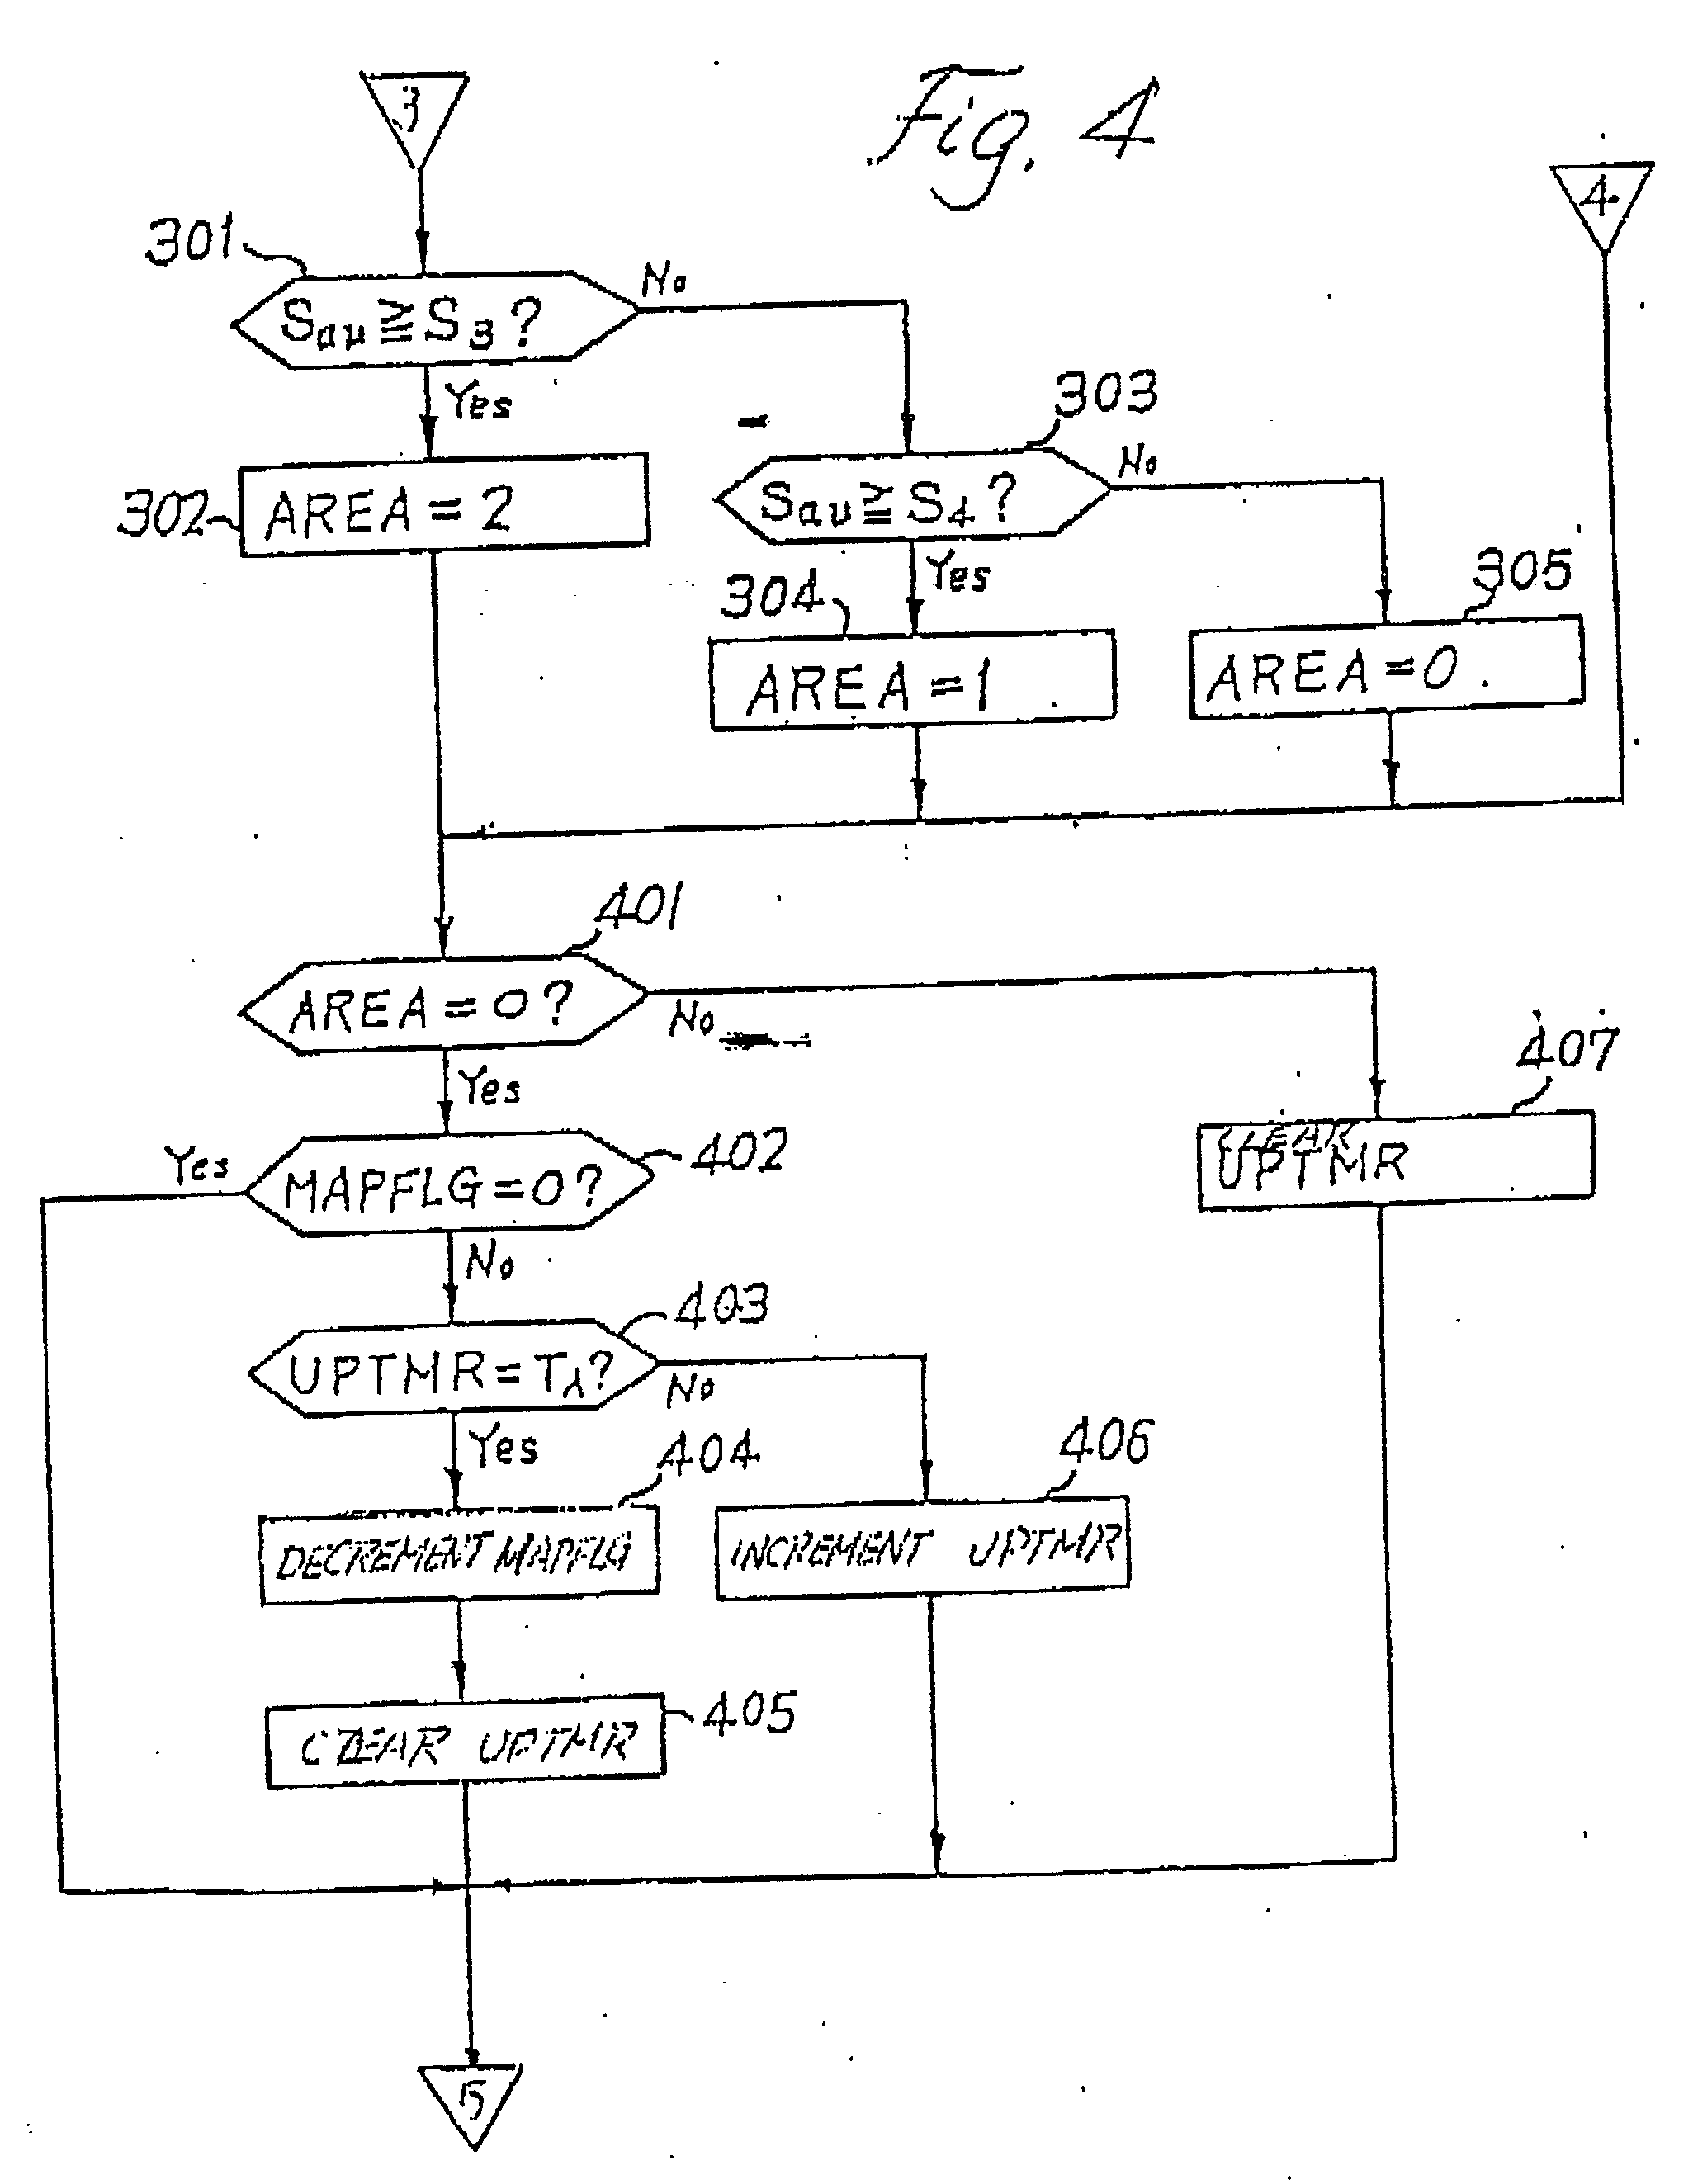 f150 ke system diagram f150 free engine image for user 2002 Oldsmobile  Bravada AWD Problems 2002 Oldsmobile Bravada Recalls